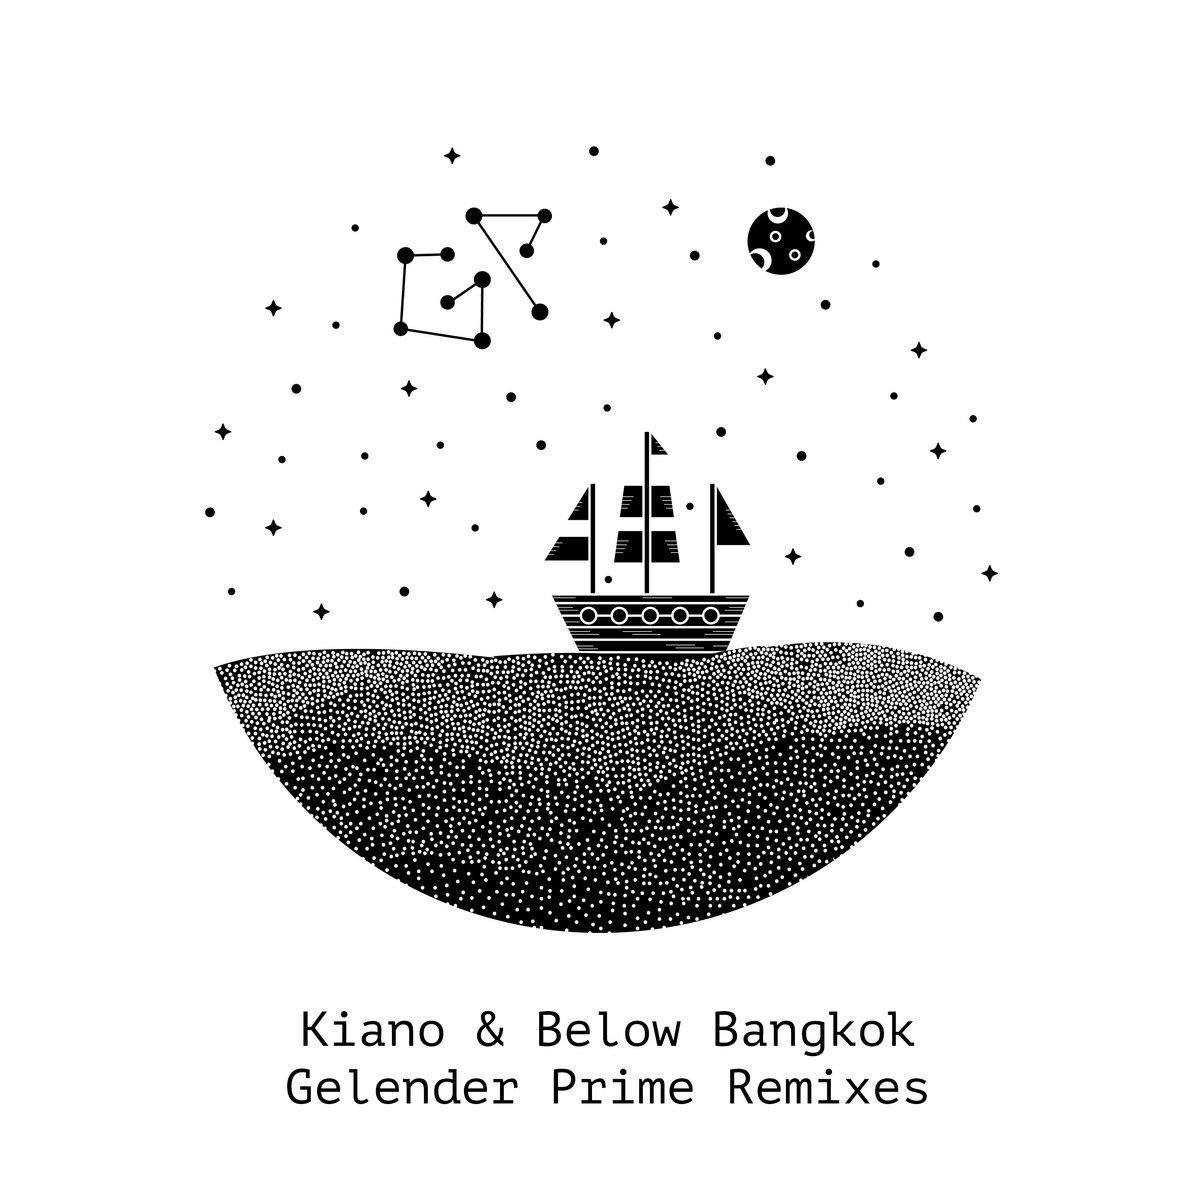 Kiano & Below Bangkok Gelender Prime Remixes